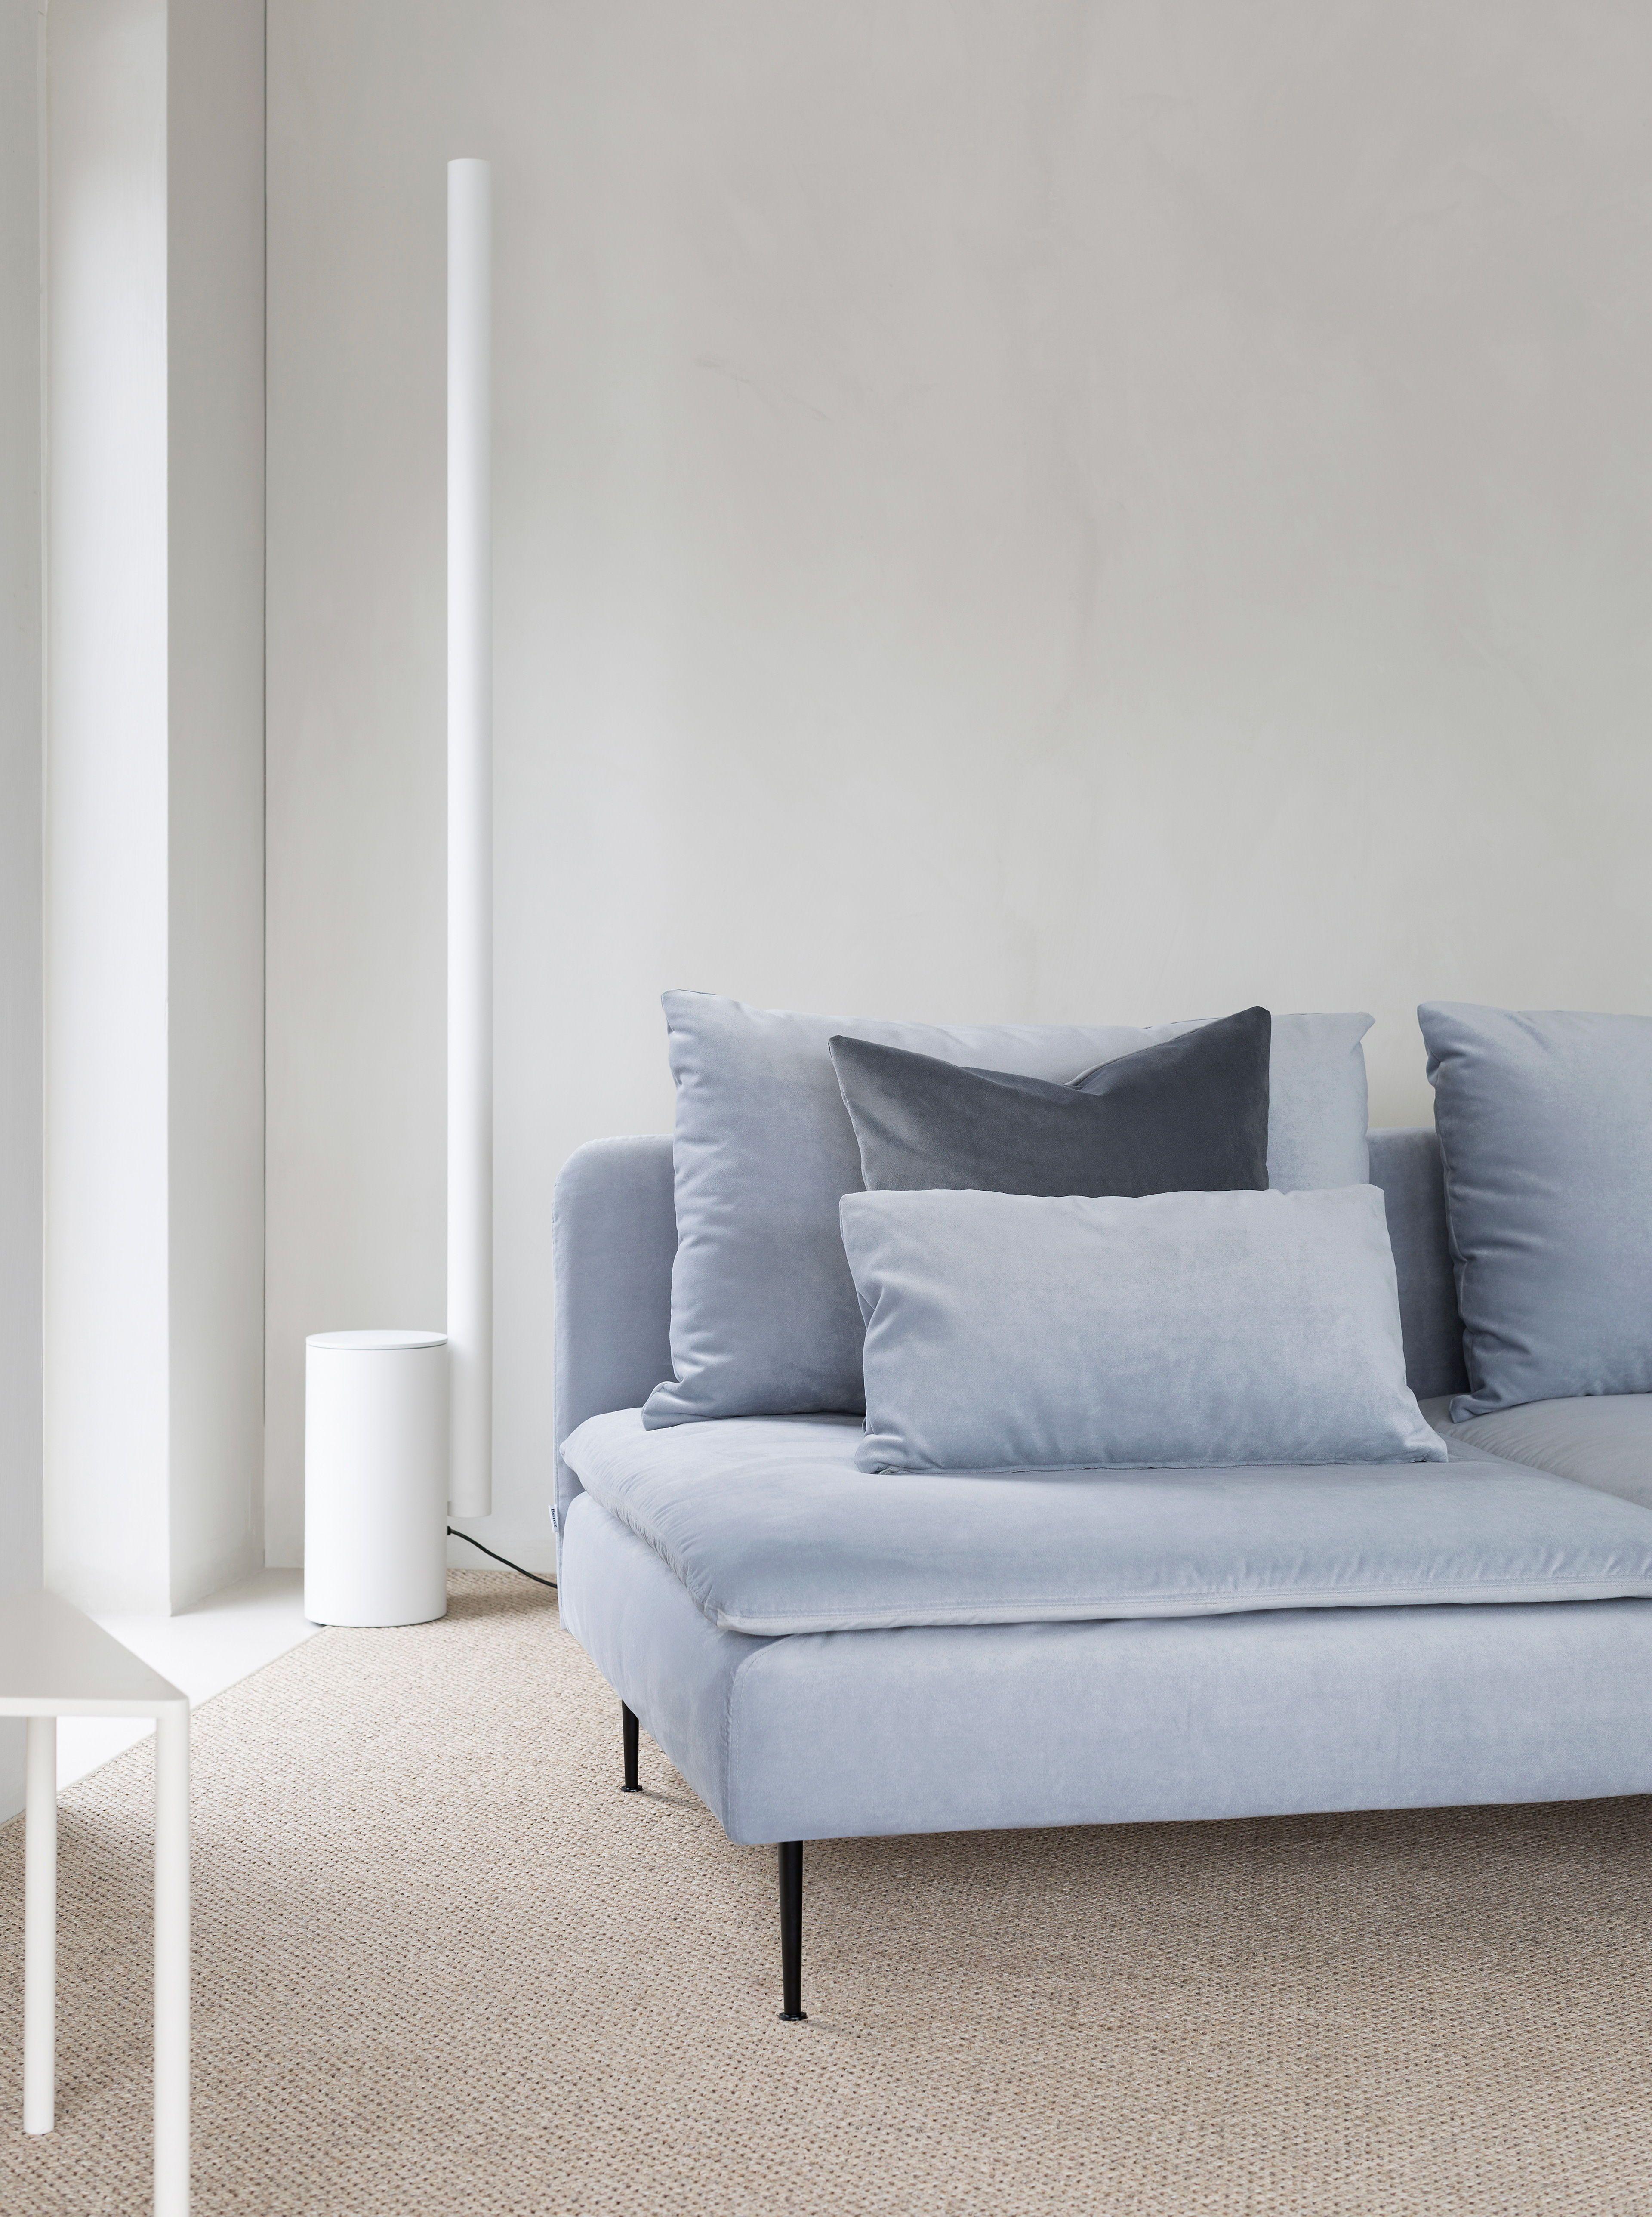 Minimalist Living Room Featuring A Grey Velvet Sofa White Floor Lamp Ikea Soderhamn So Minimalist Living Room Minimalist Living Room Design Minimalist Sofa